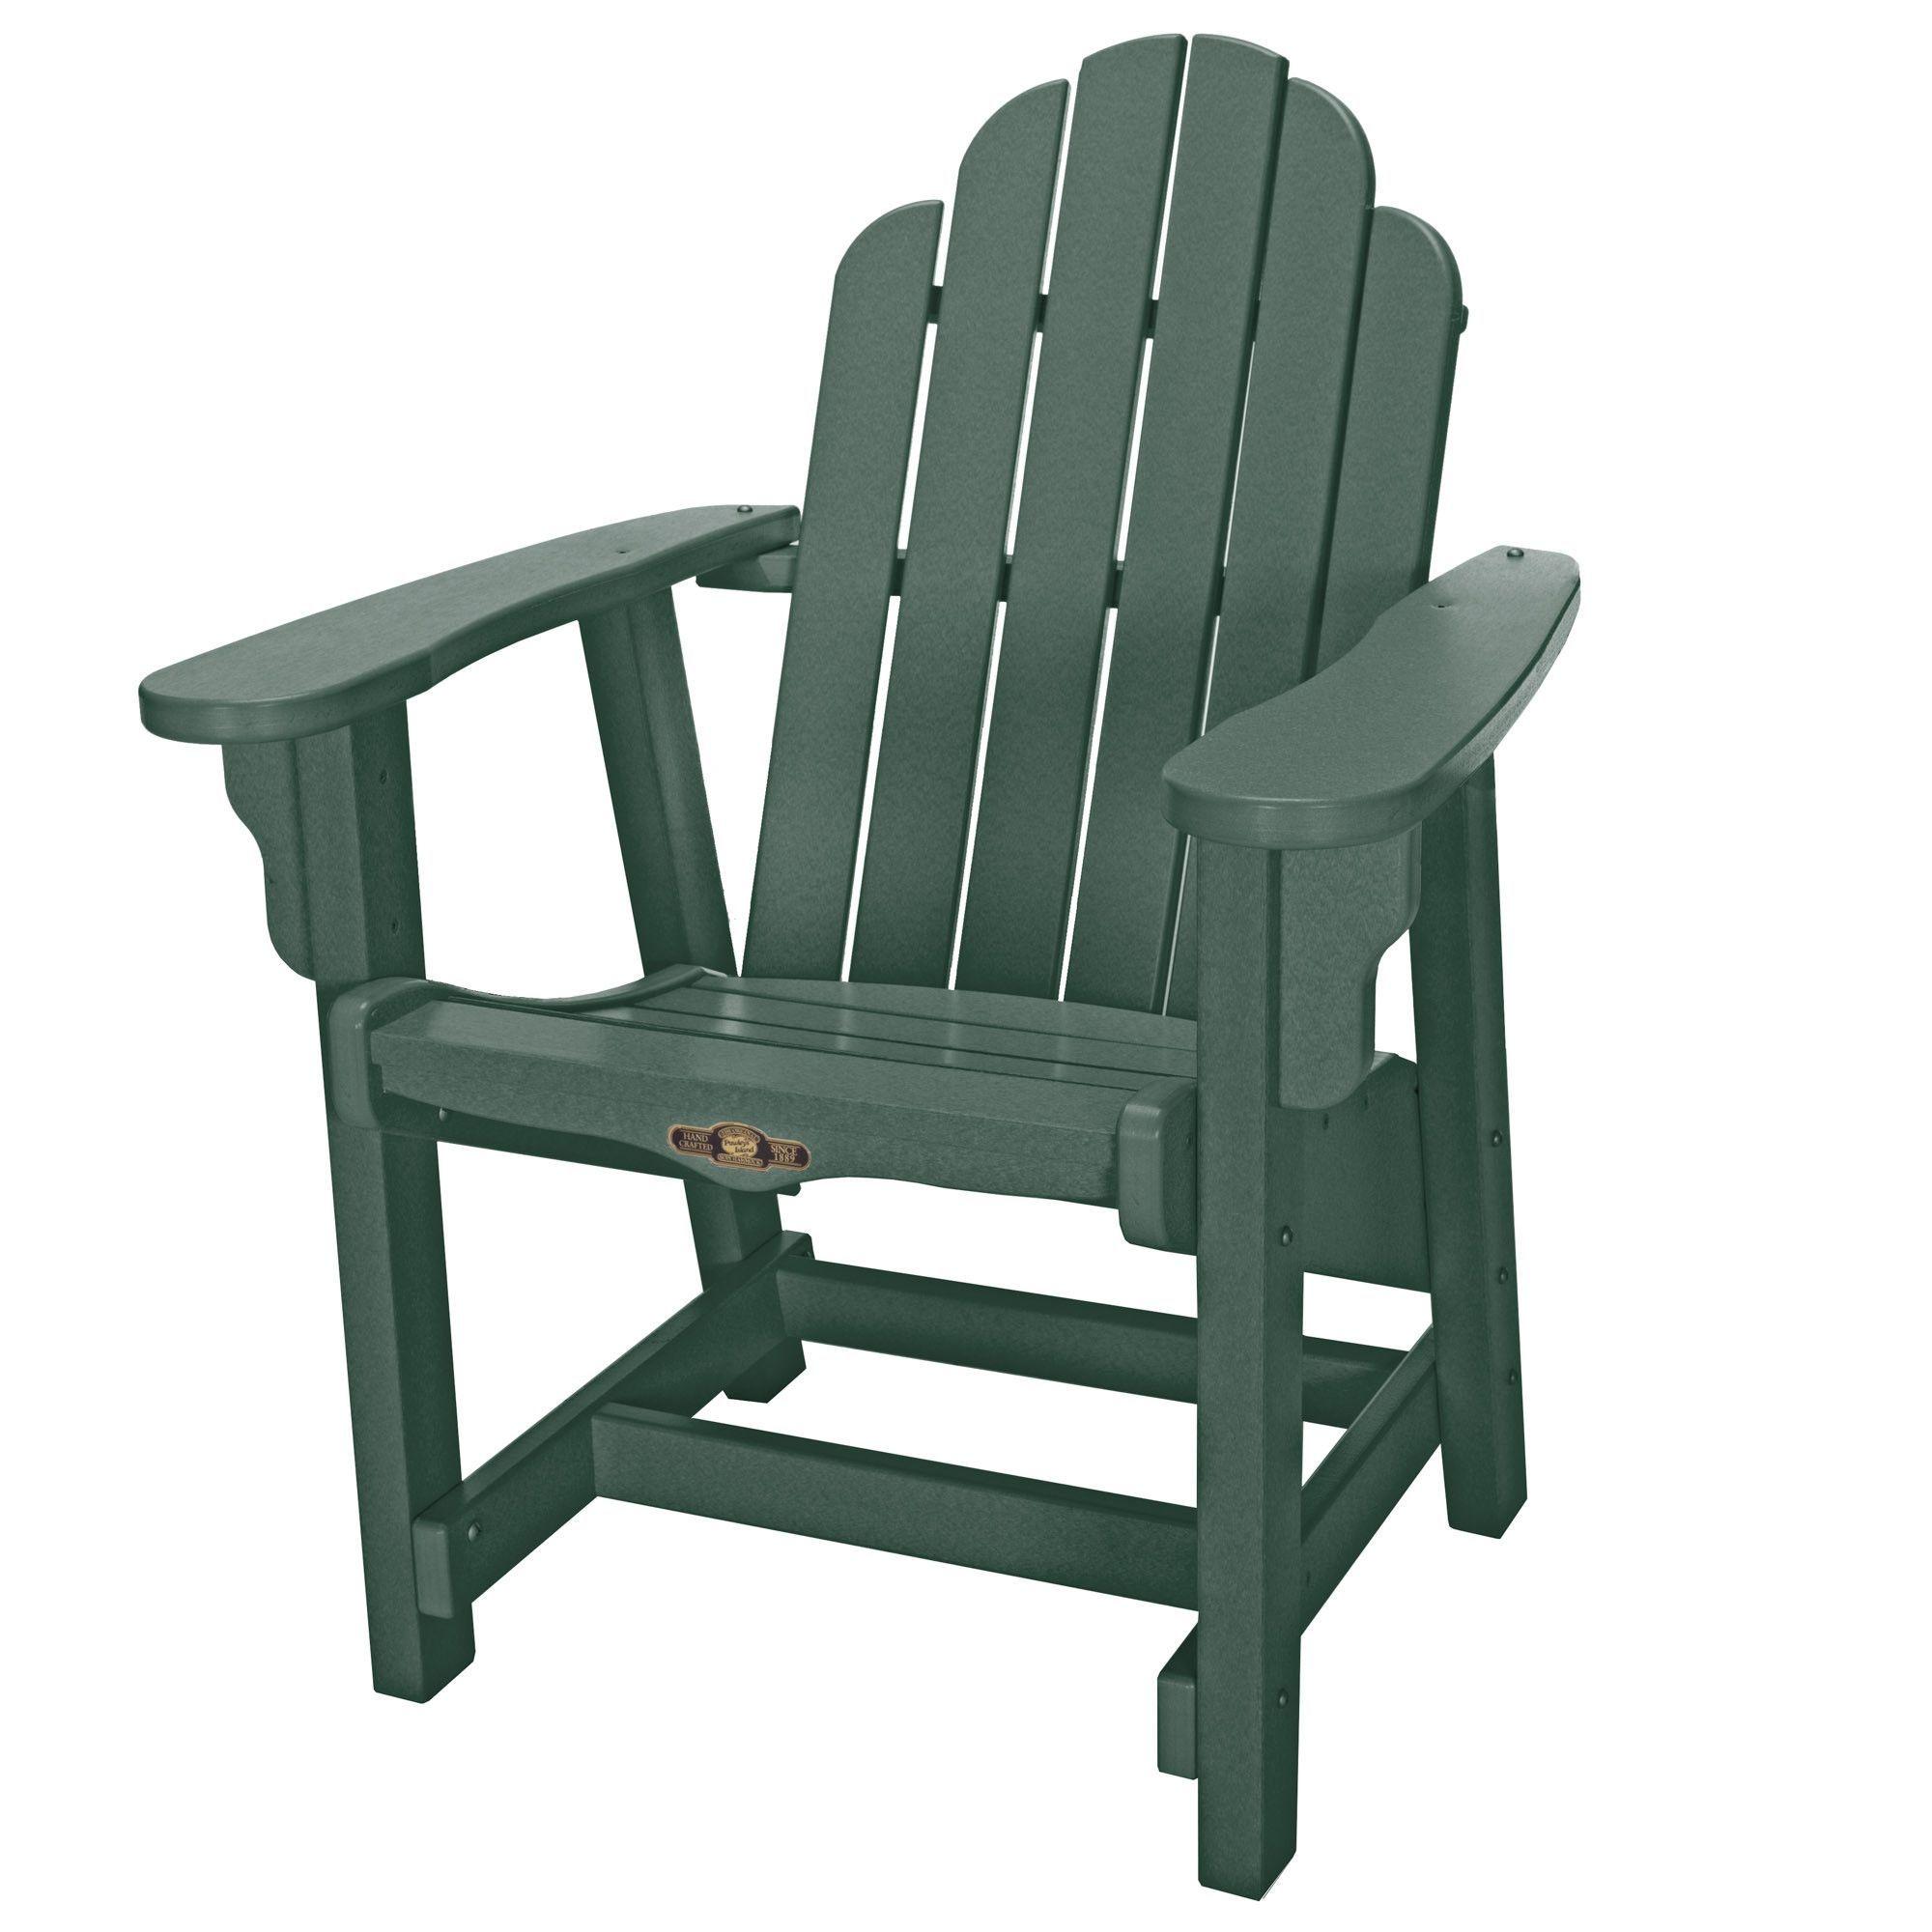 Pawleys Island Recycled Plastic Essentials Conversational Chair